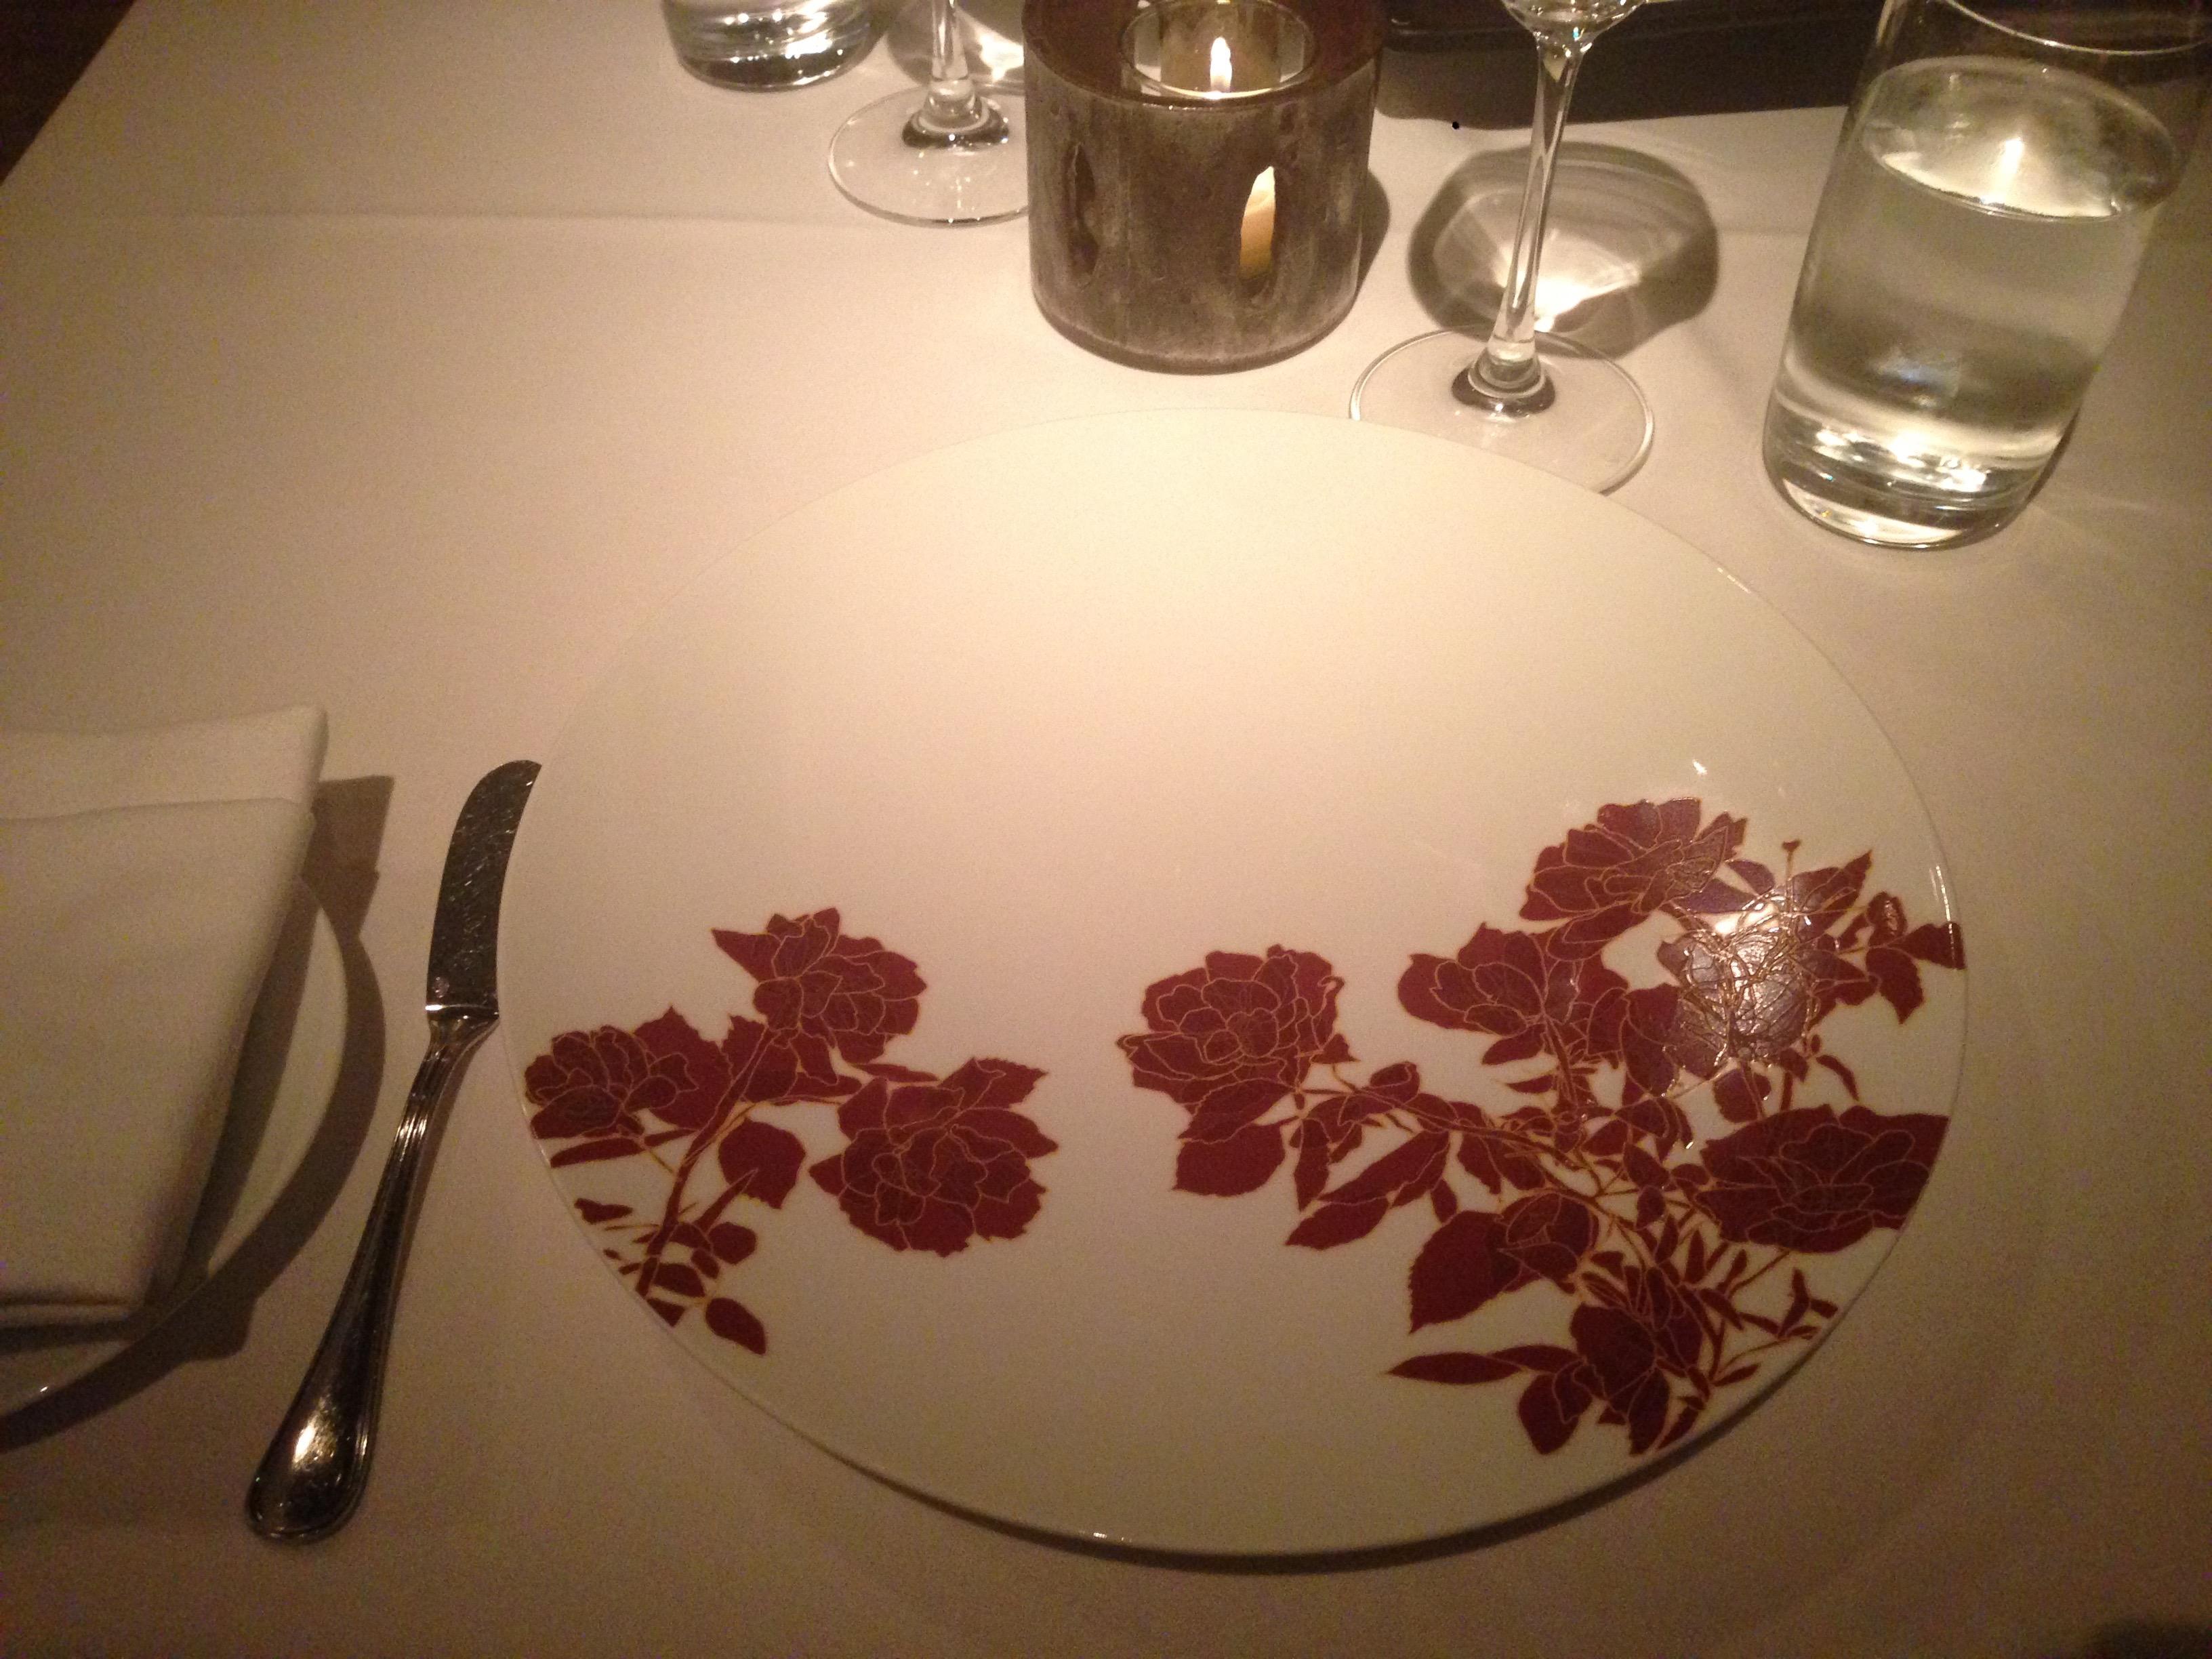 Gramercy Tavern New York City 9 19 14 Dining With Frankie